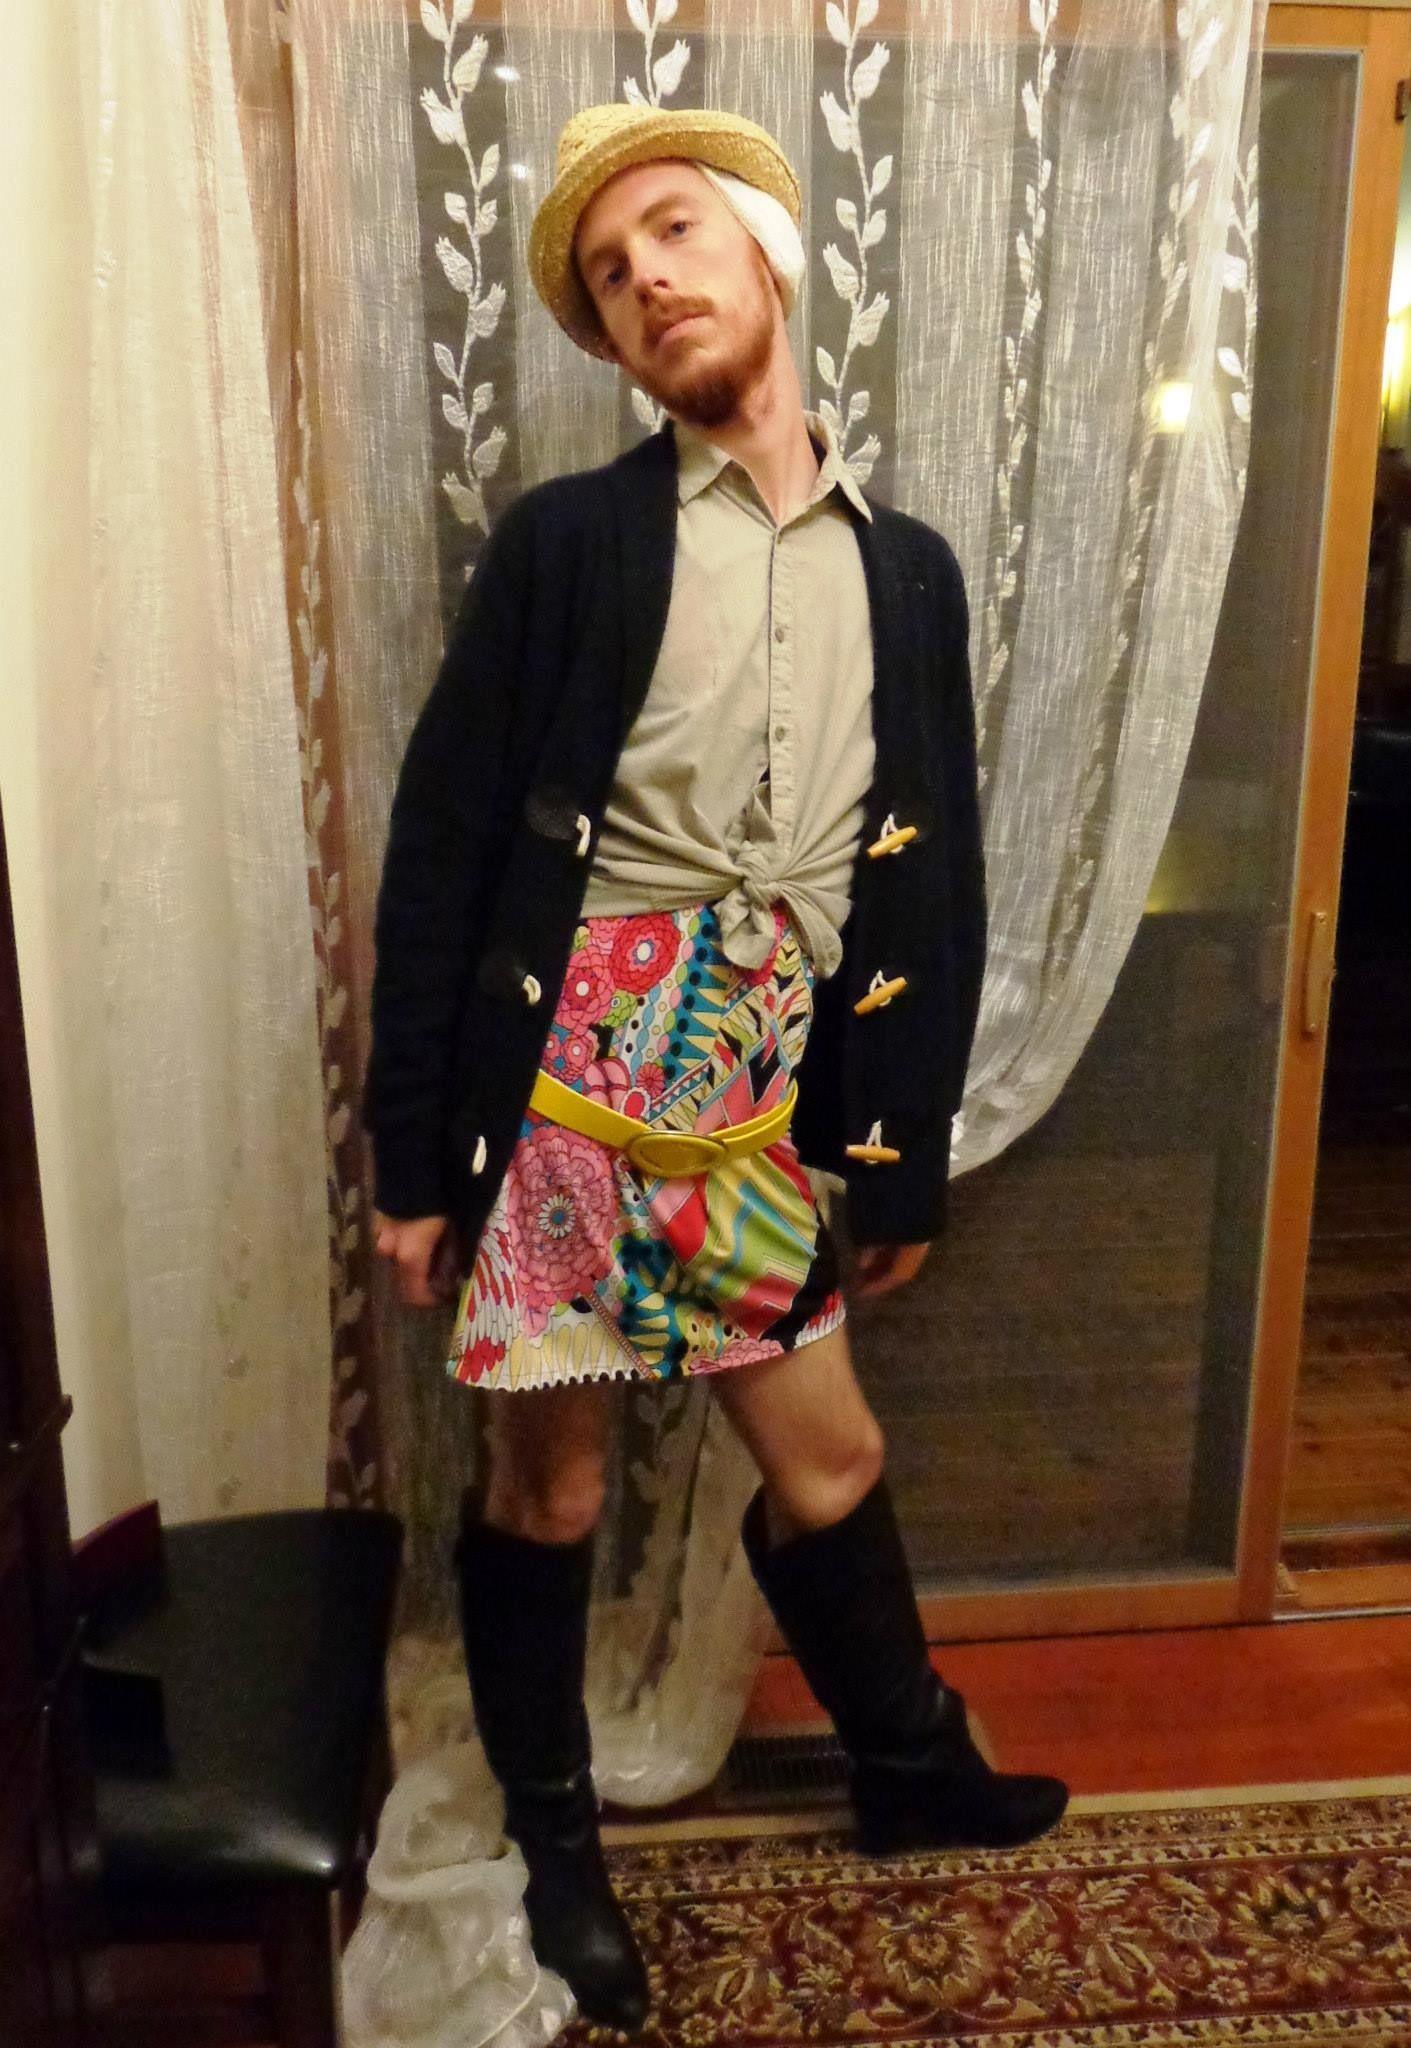 caterpillar shoes edgars clothing 2017 anime resident